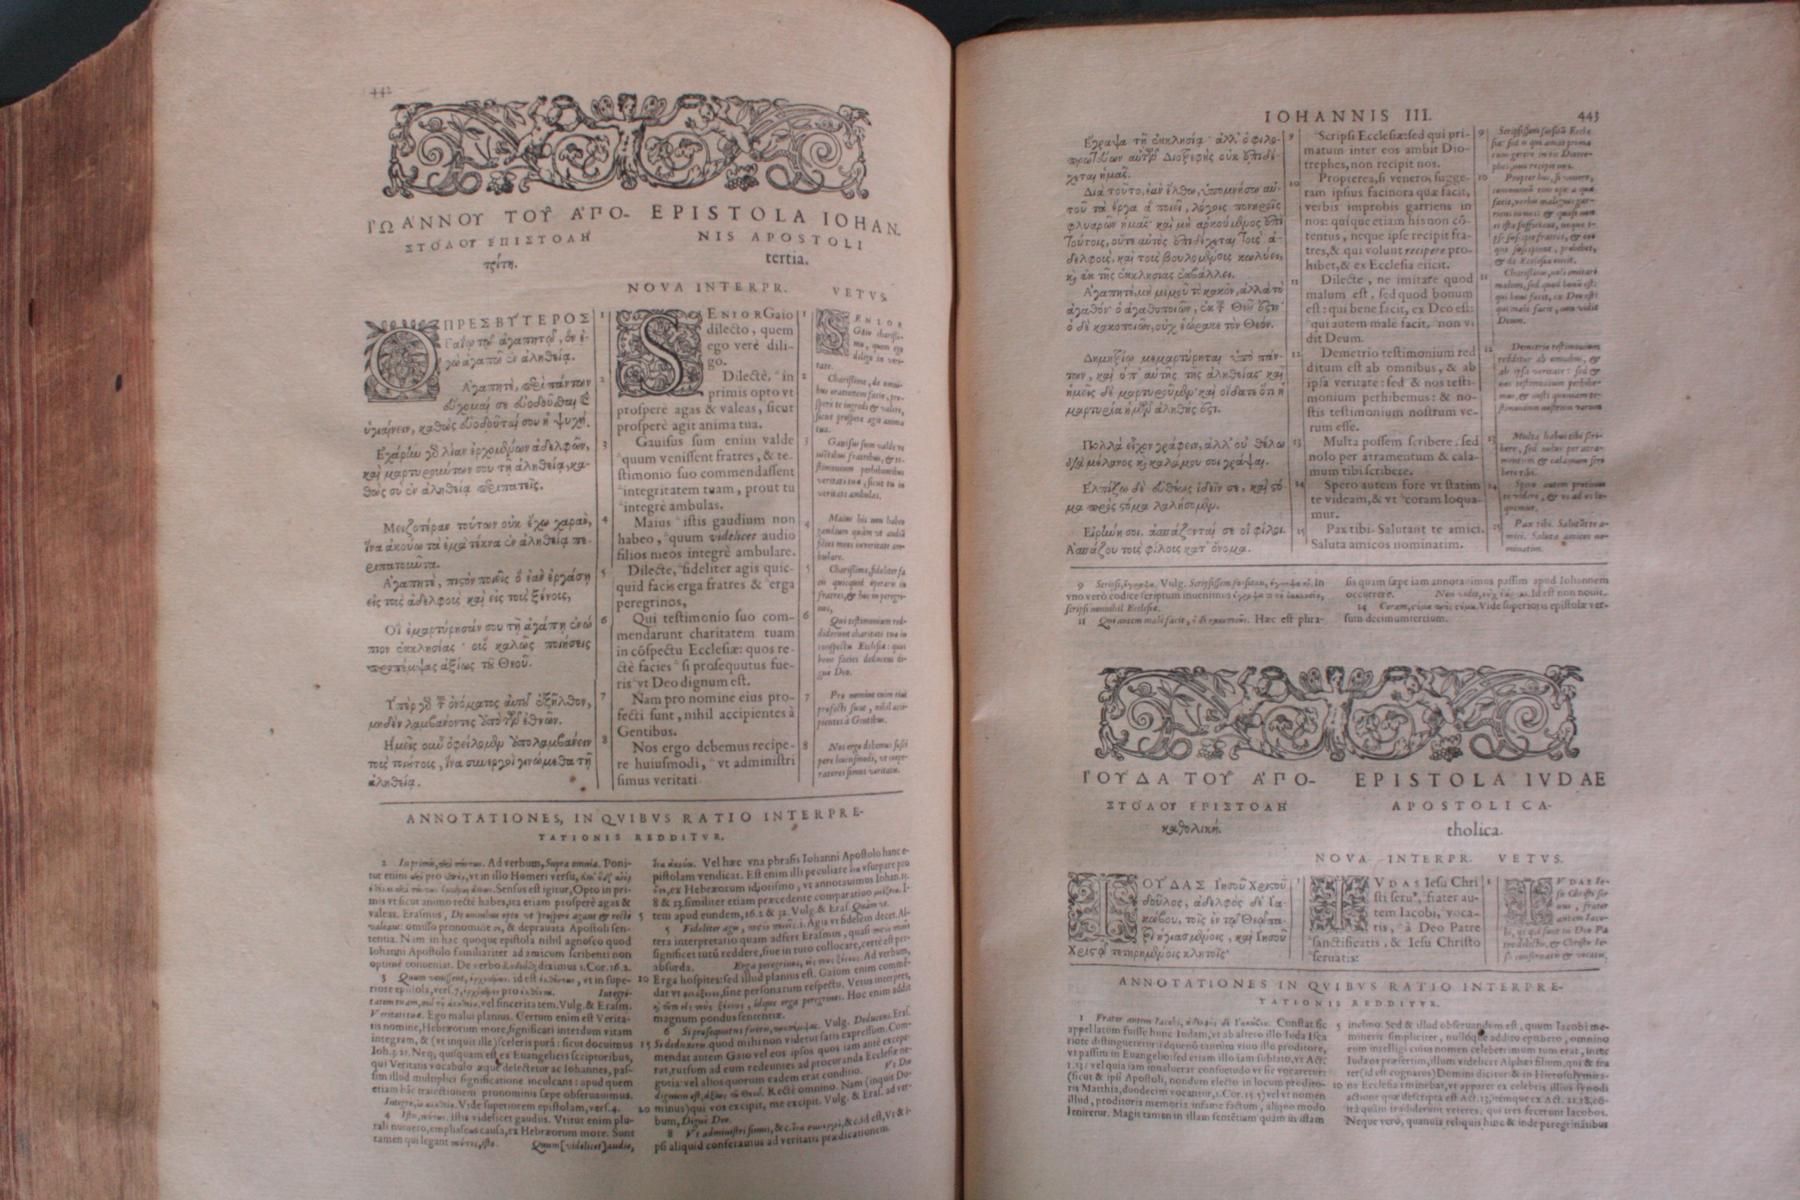 Griechische-Lateinische Bibel, Novum Testamentum 1582-19